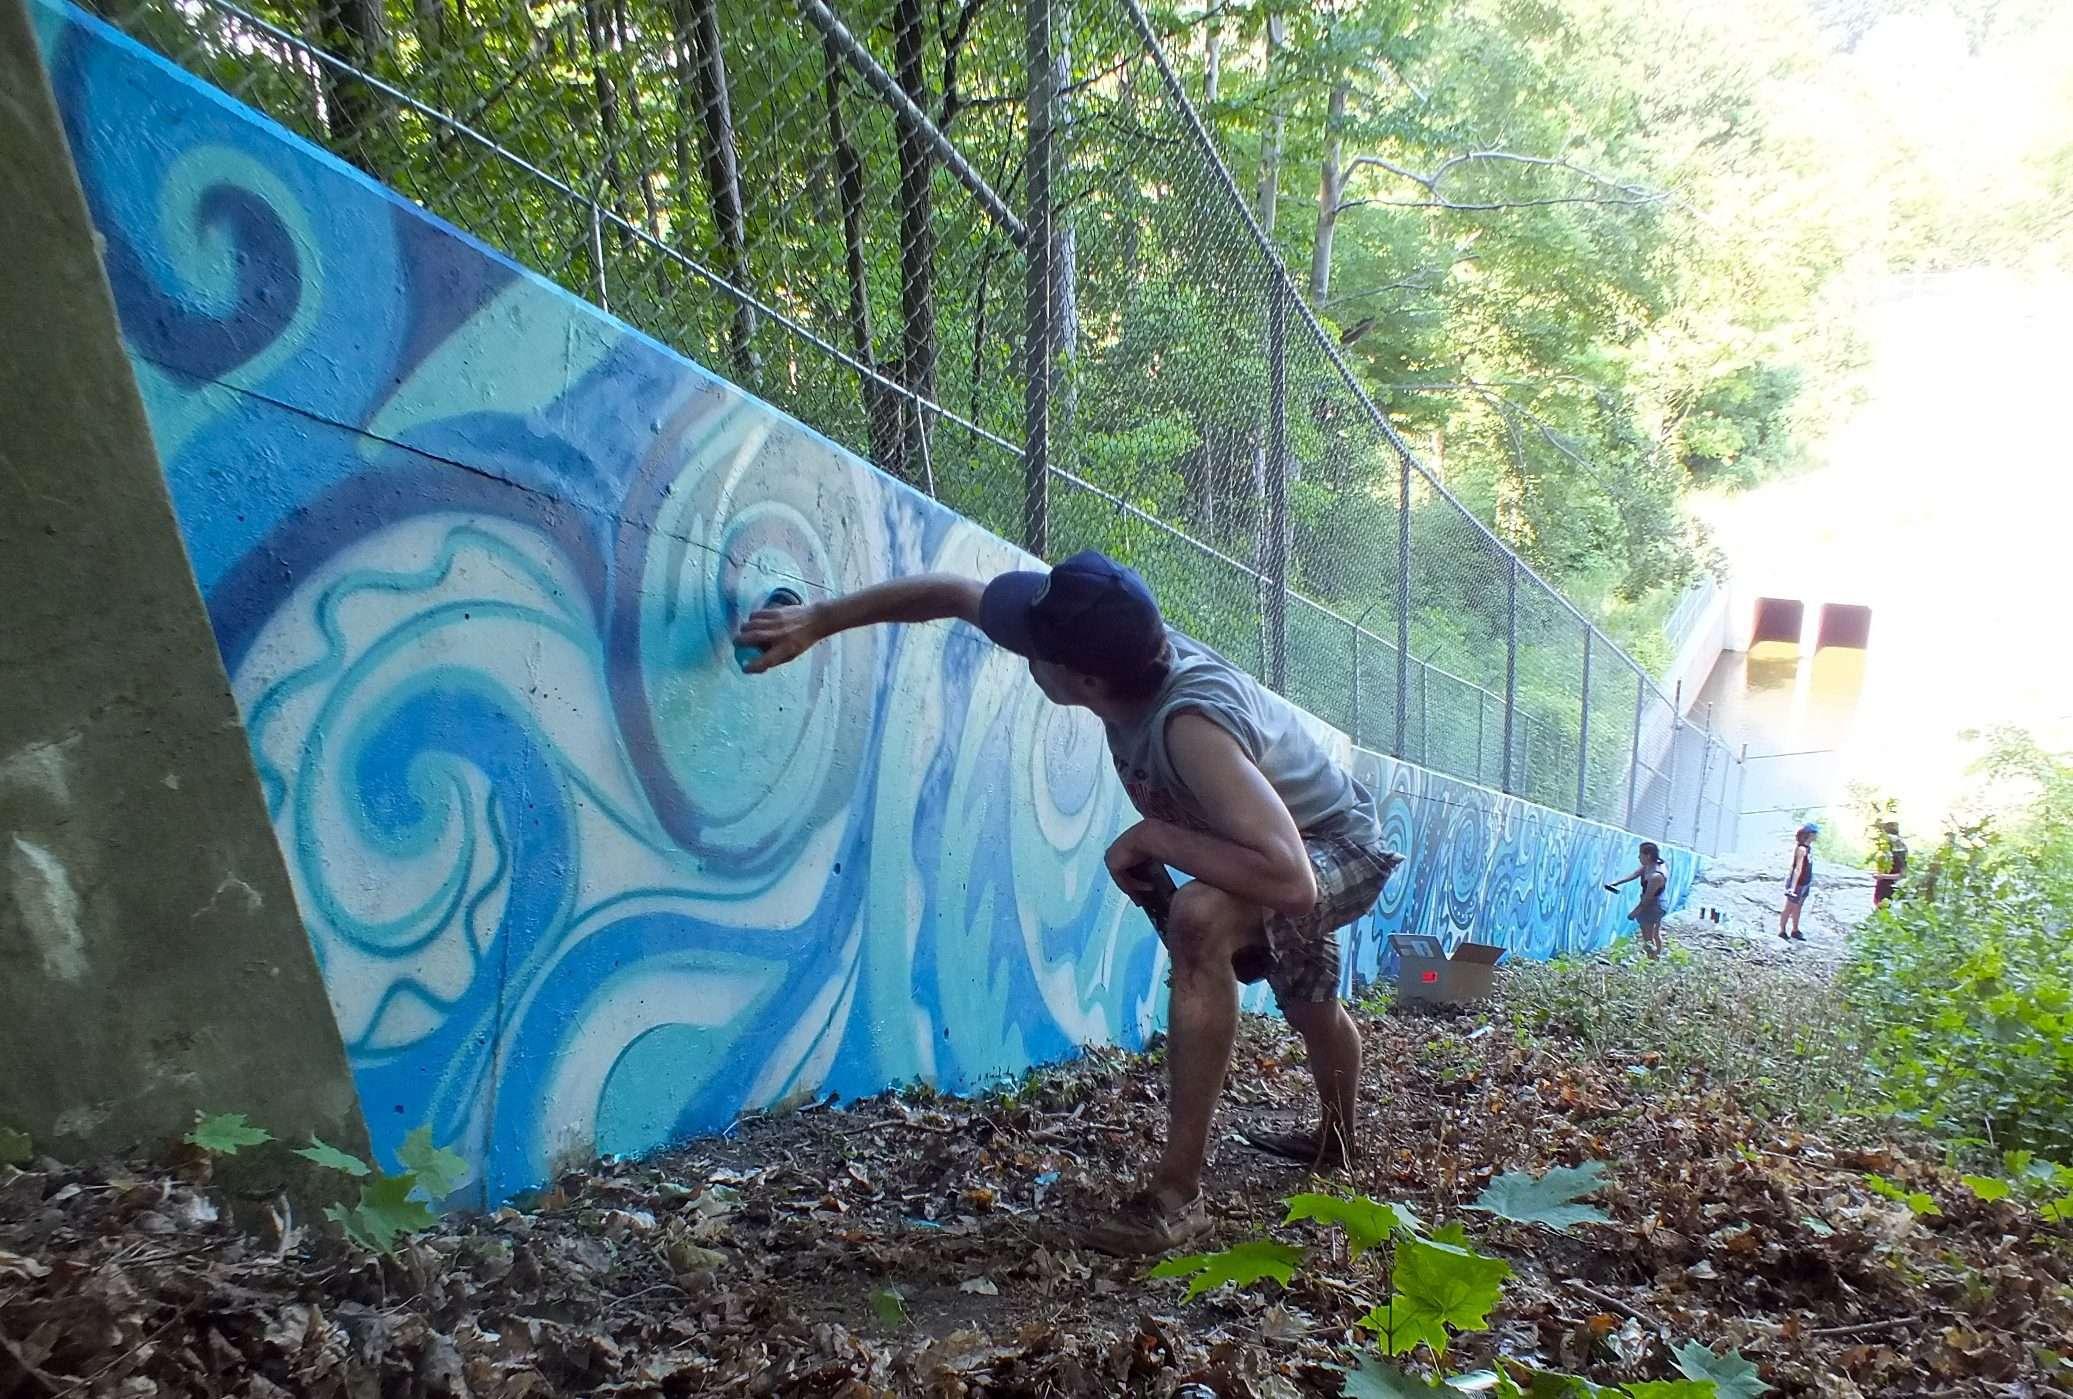 Naturescapes youth paints